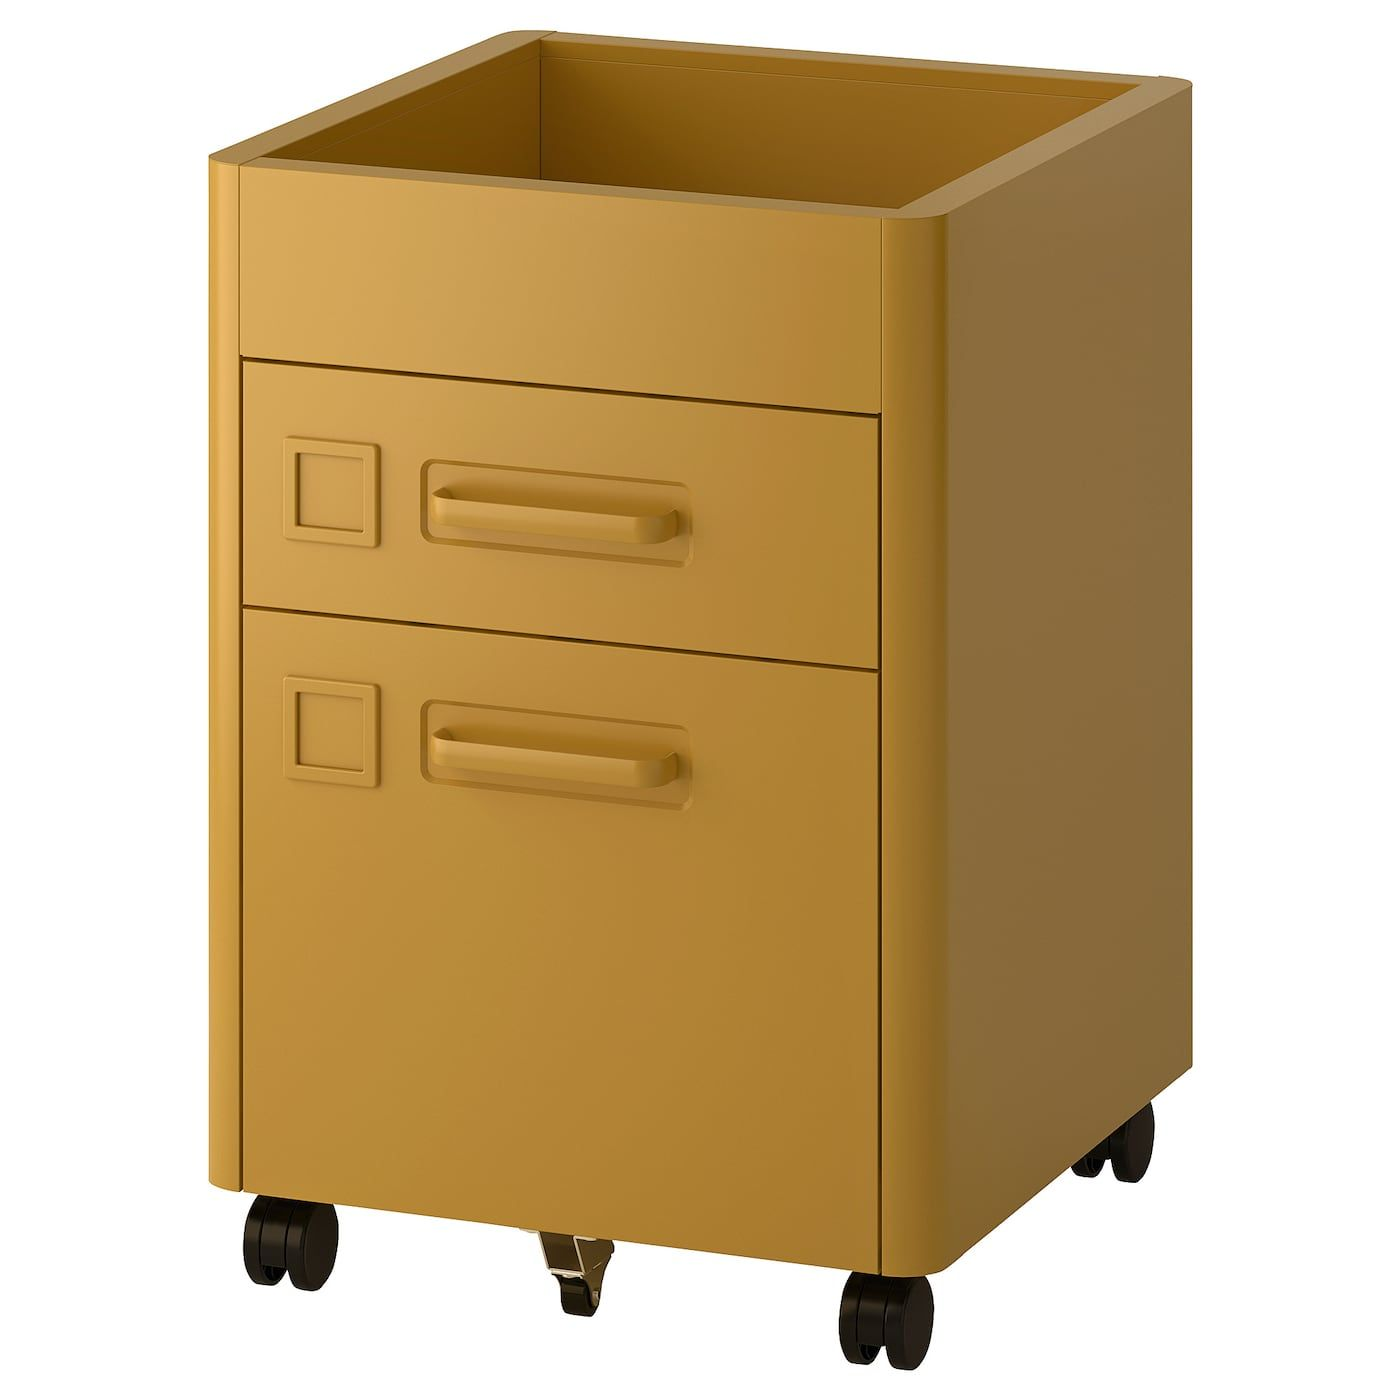 Ikea Galant Caisson Idees